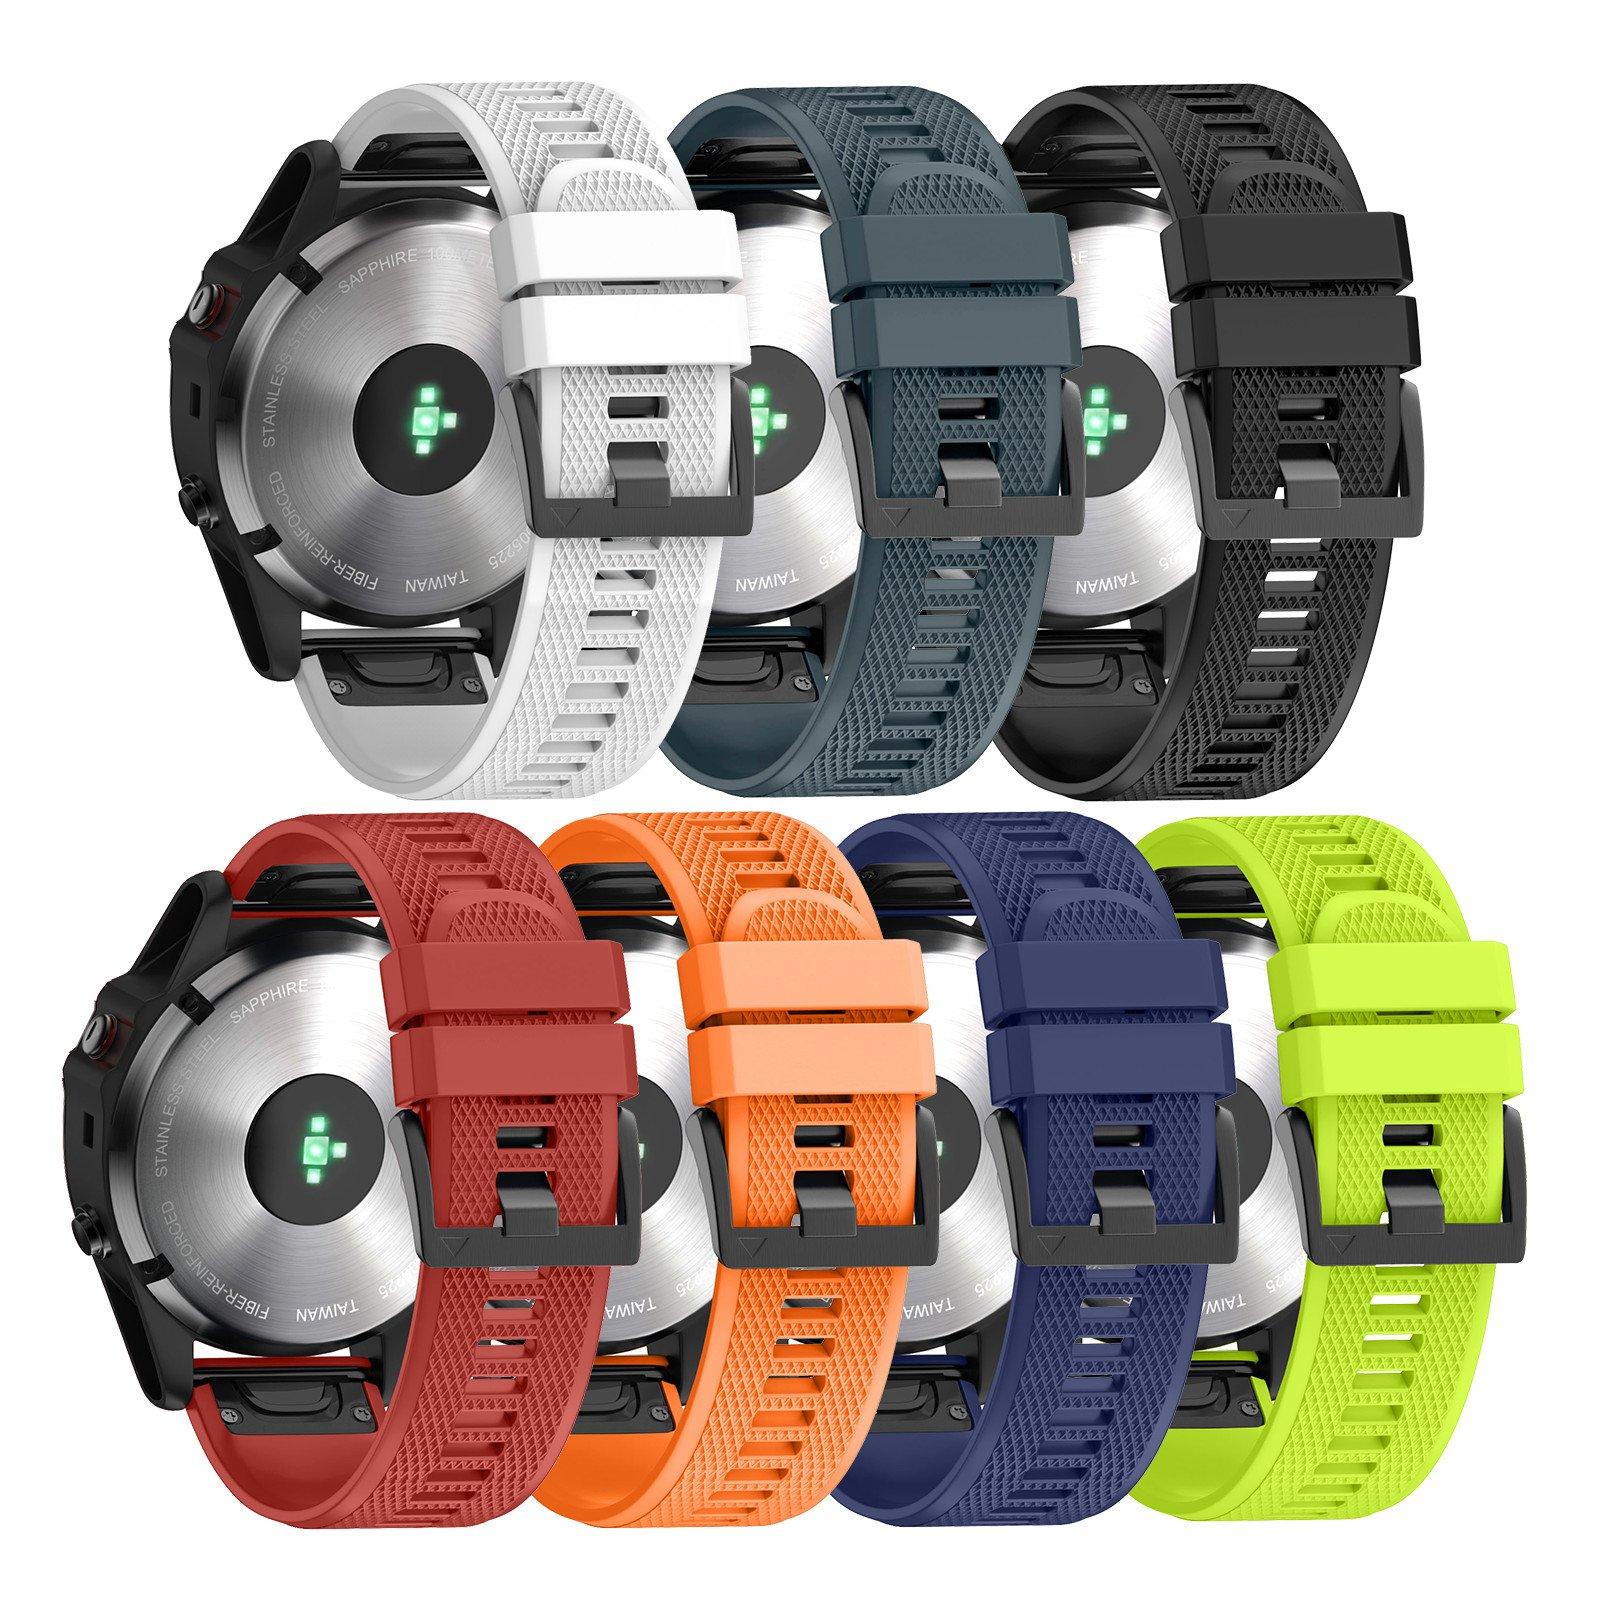 ANCOOL Compatible Garmin Fenix 5 Band Easy Fit 22mm Width Soft Silicone Watch Strap Compatible Garmin Fenix 5/Fenix 5 Plus/Forerunner 935/Approach S60/Quatix 5 - Pack of 7